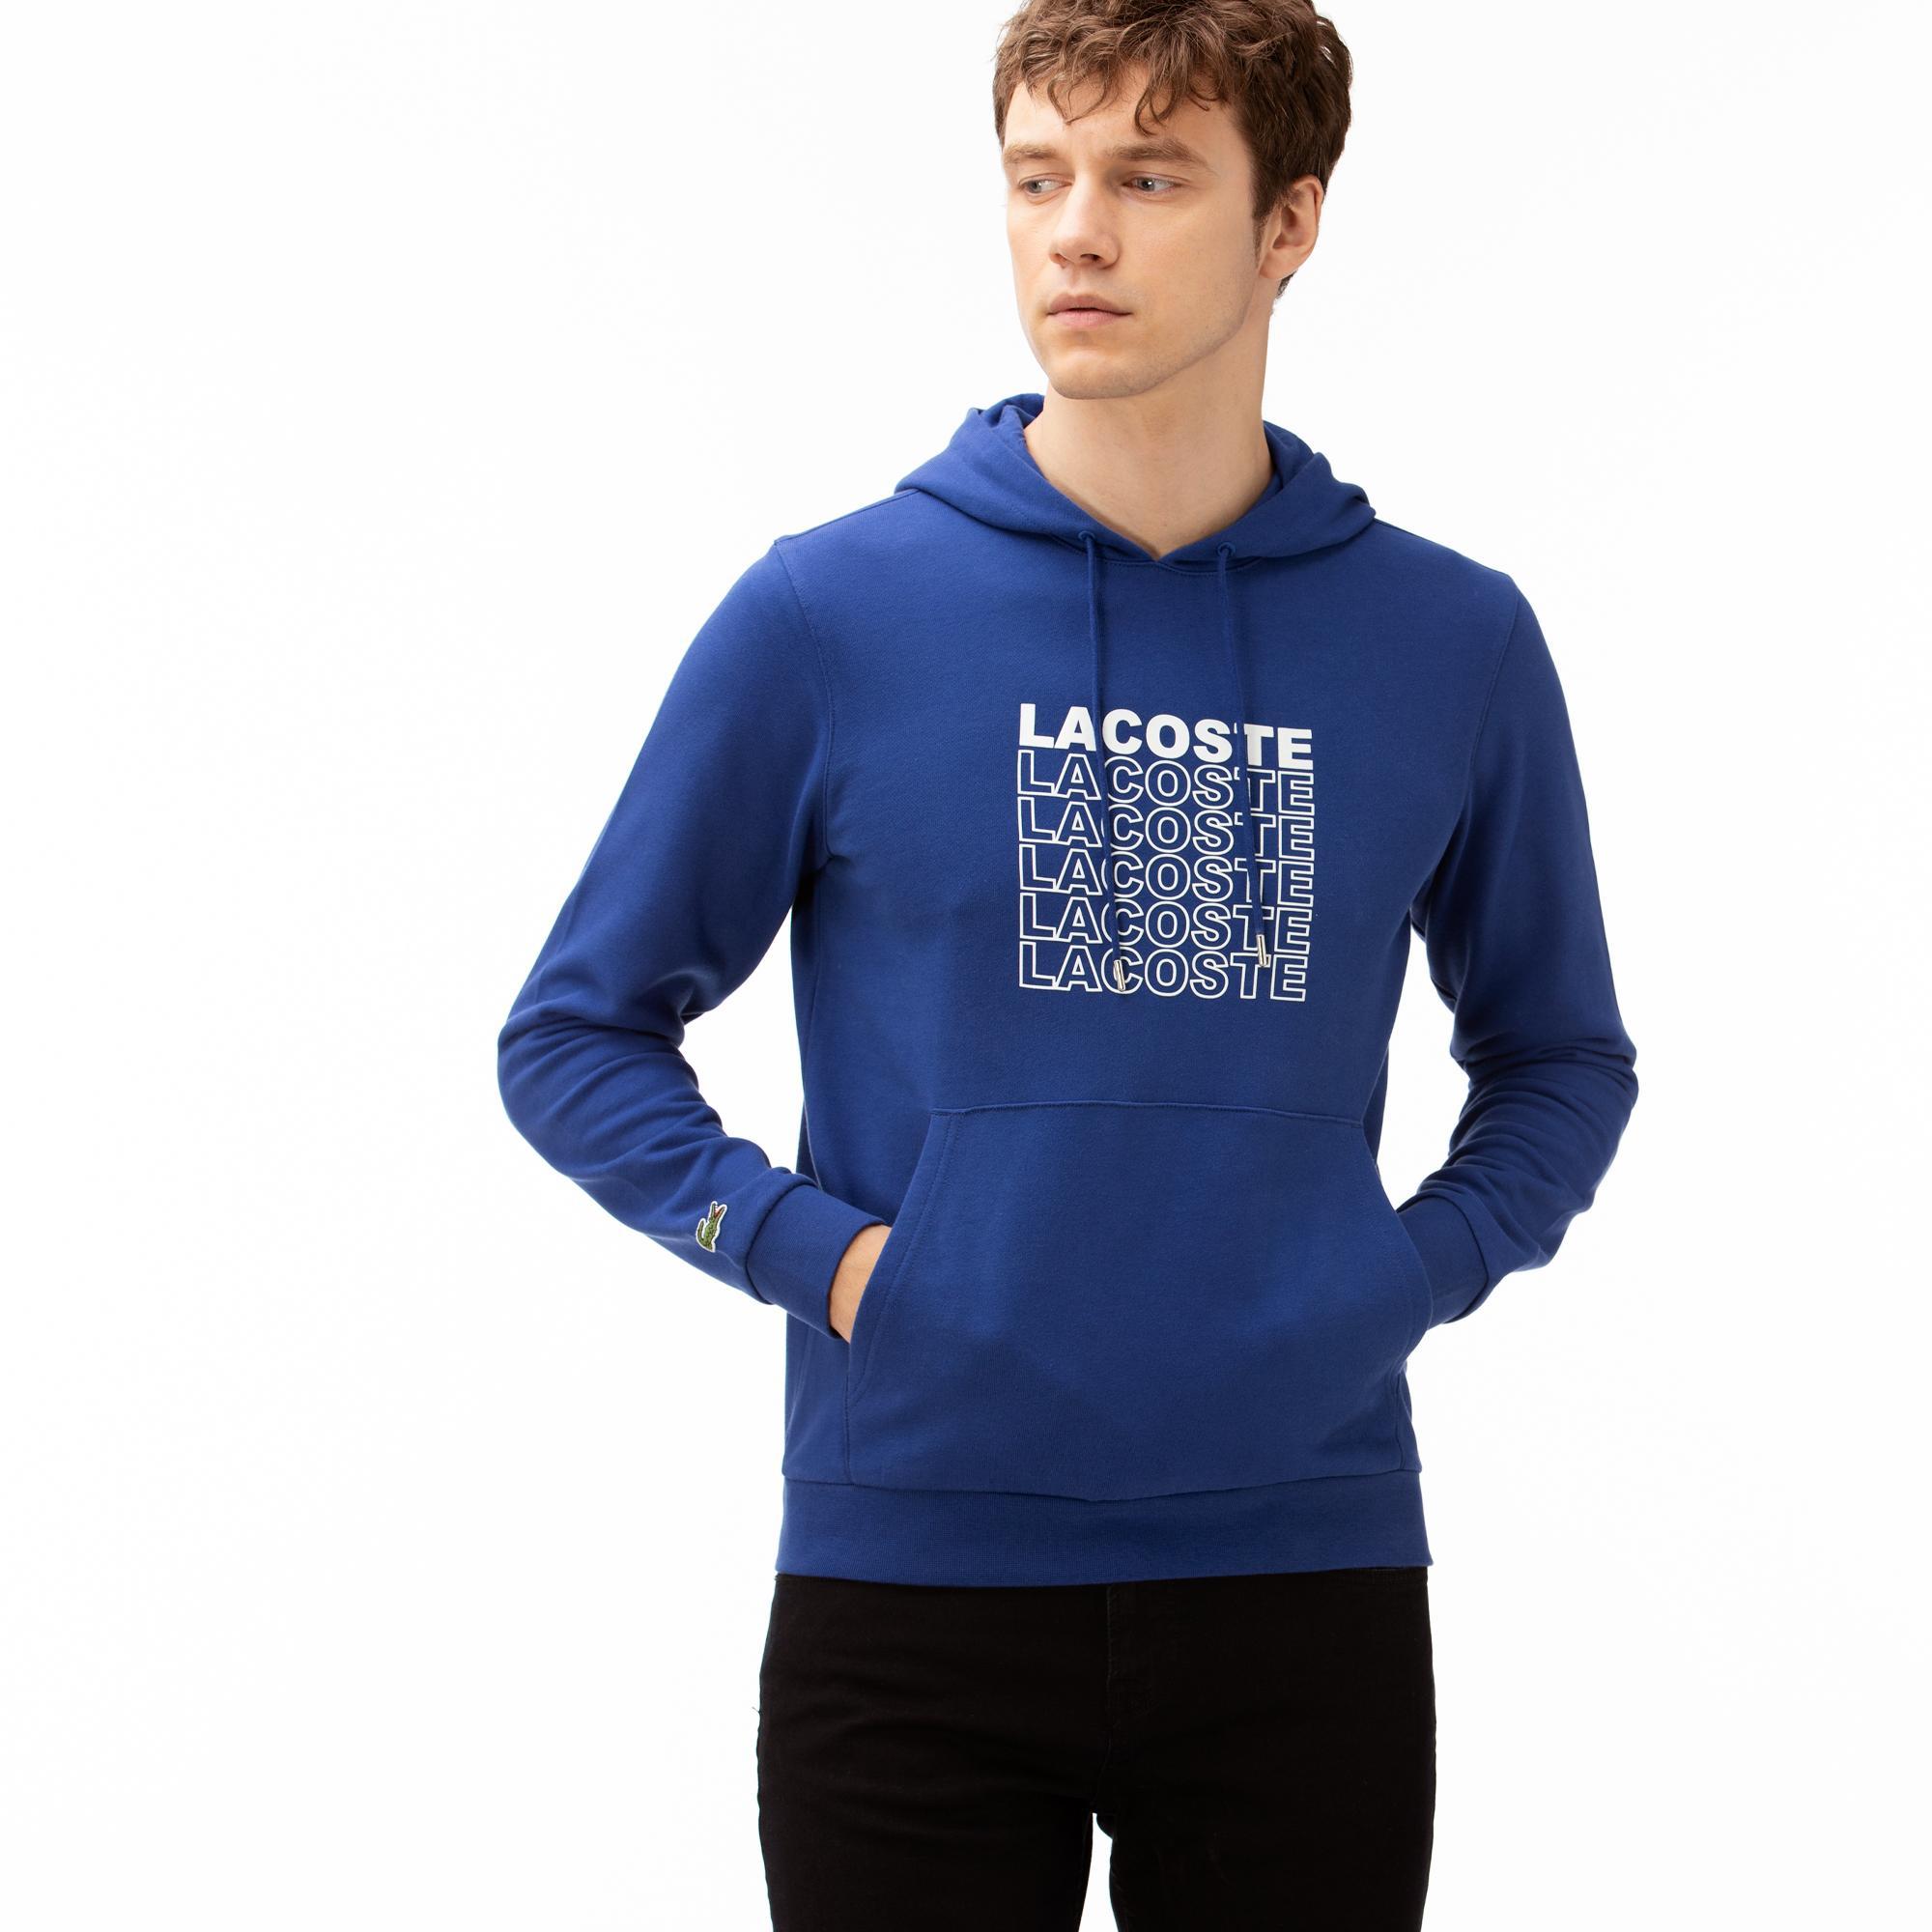 Lacoste Erkek Kapüşonlu Lacivert Sweatshirt